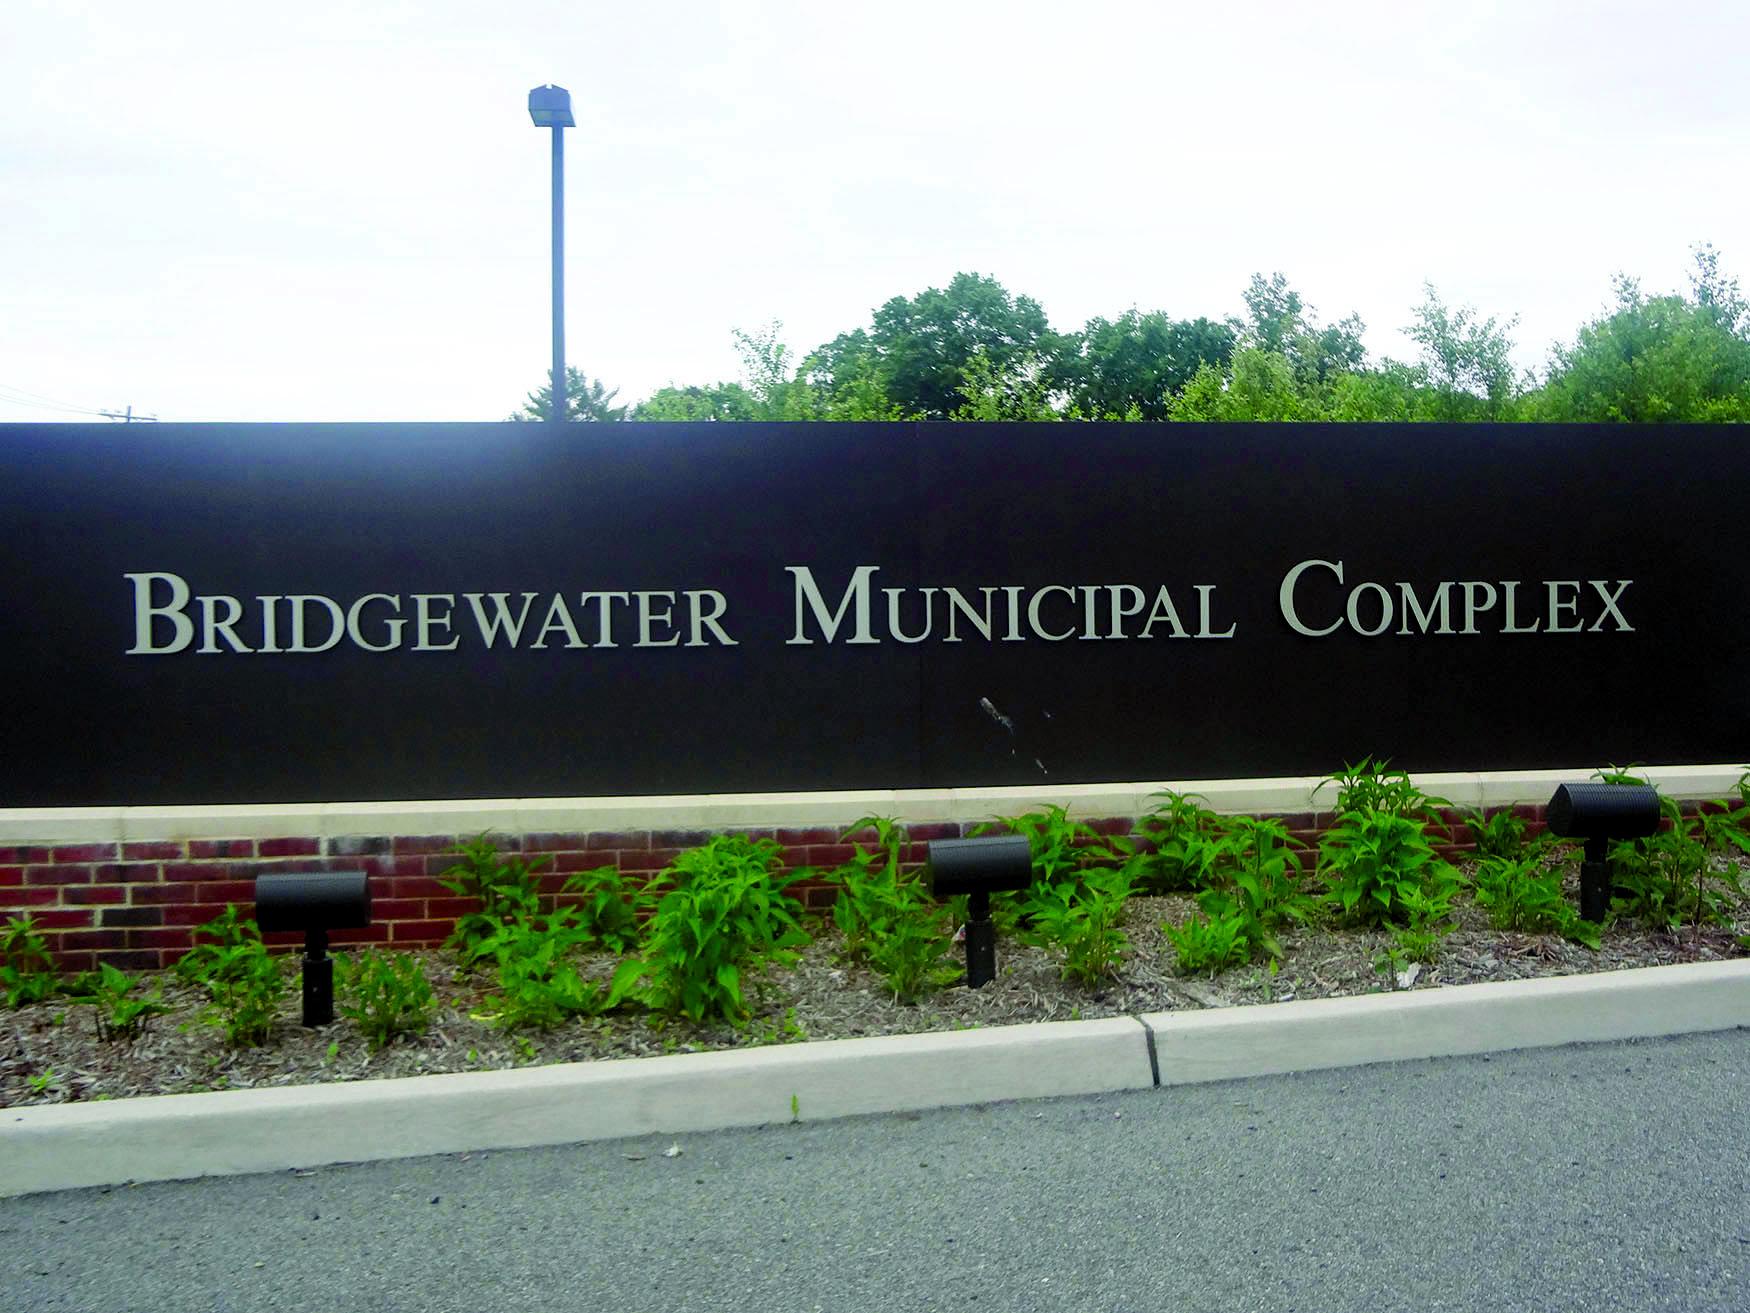 2437fd5bf21eaf4b063f_Bridgewater_municipal.jpg